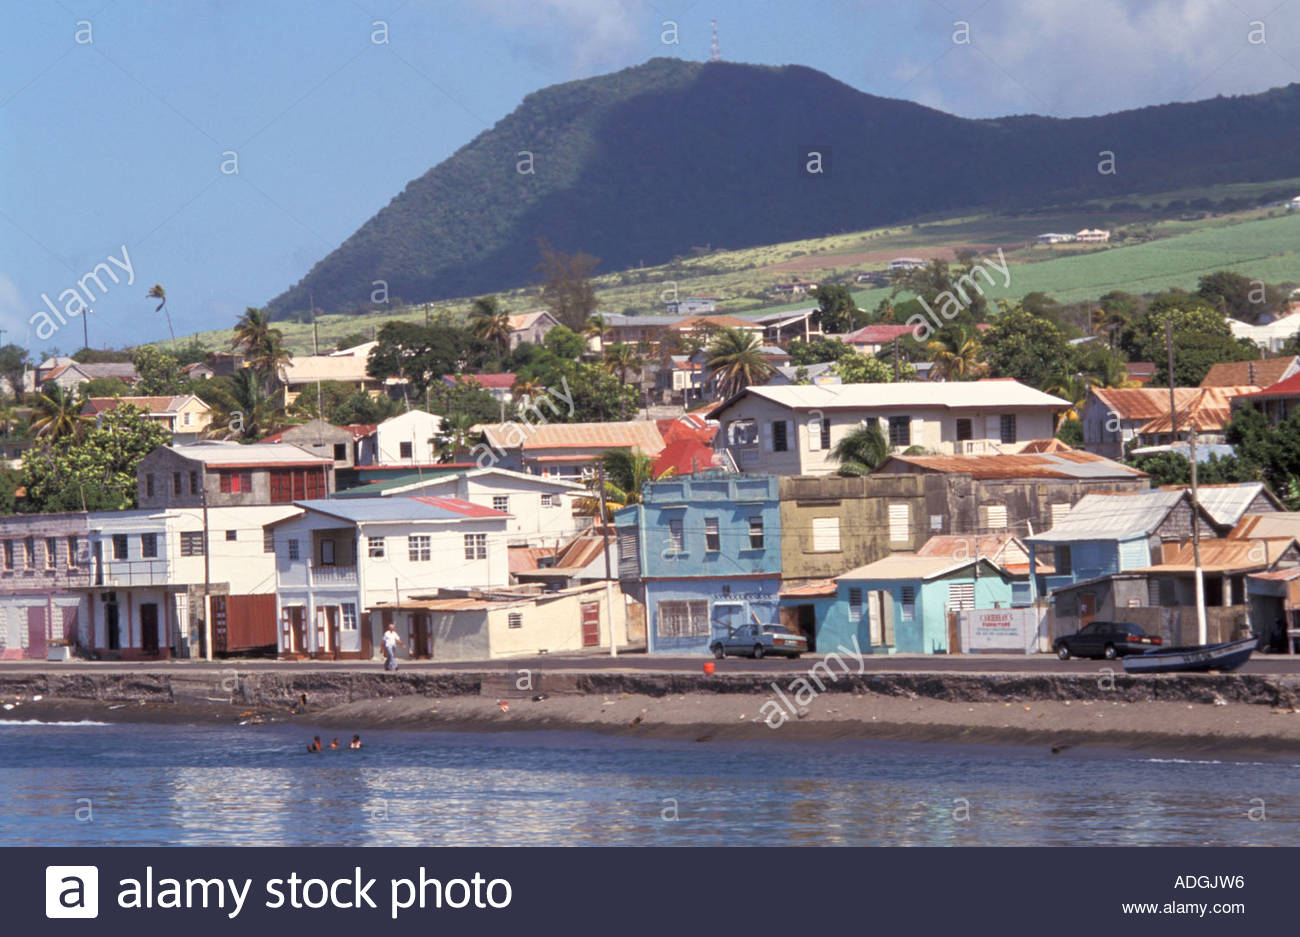 Stock photo the capital city basseterre saint kitts and nevis leeward islands caribbean islands central america atlantic ocean